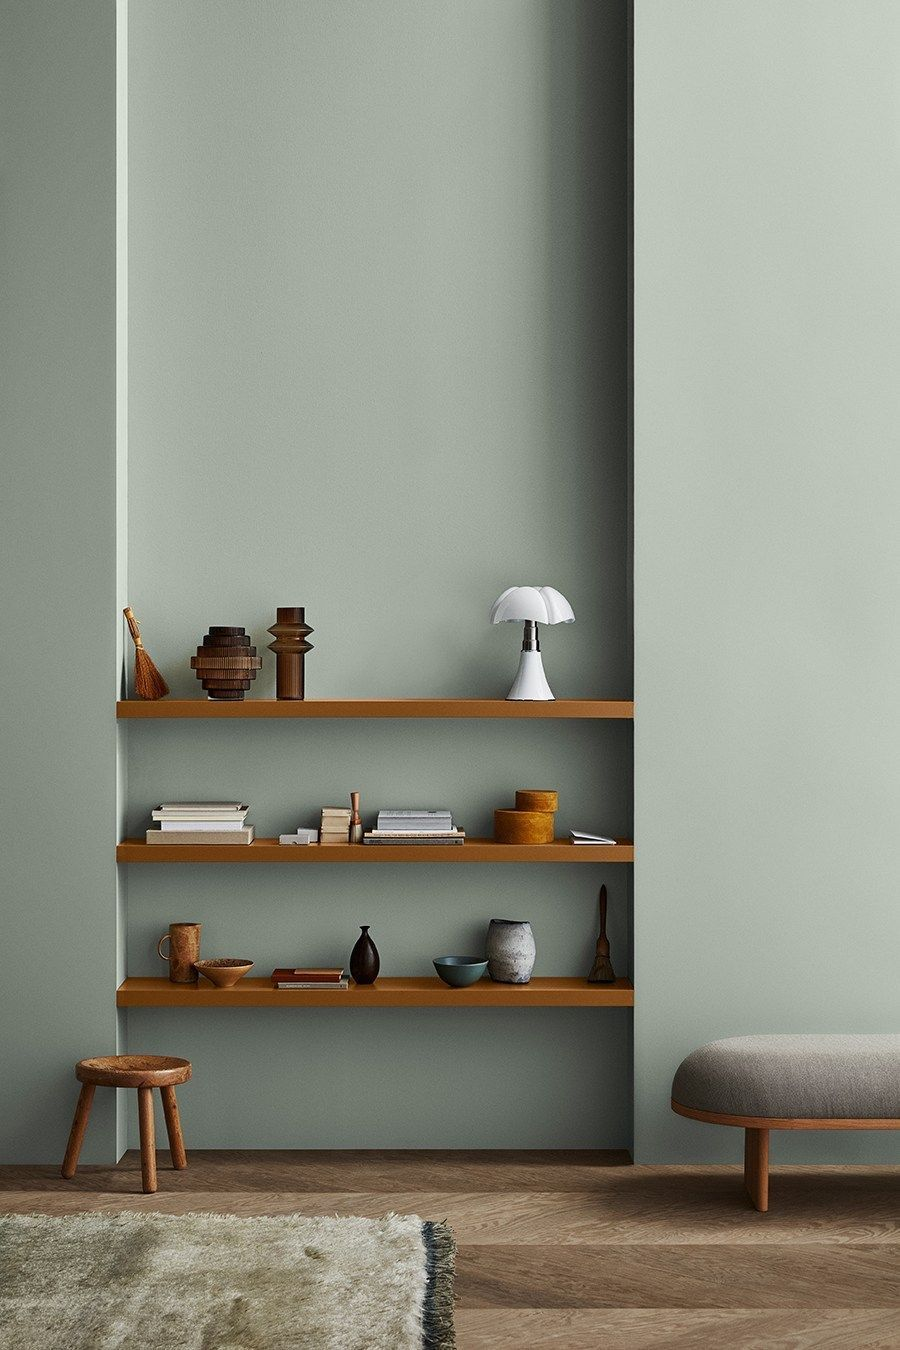 Photo of Jotun Lady farger 2020 – COCO LAPINE DESIGN, #coco # Farger #Design #diylivingroomideaspaintc …